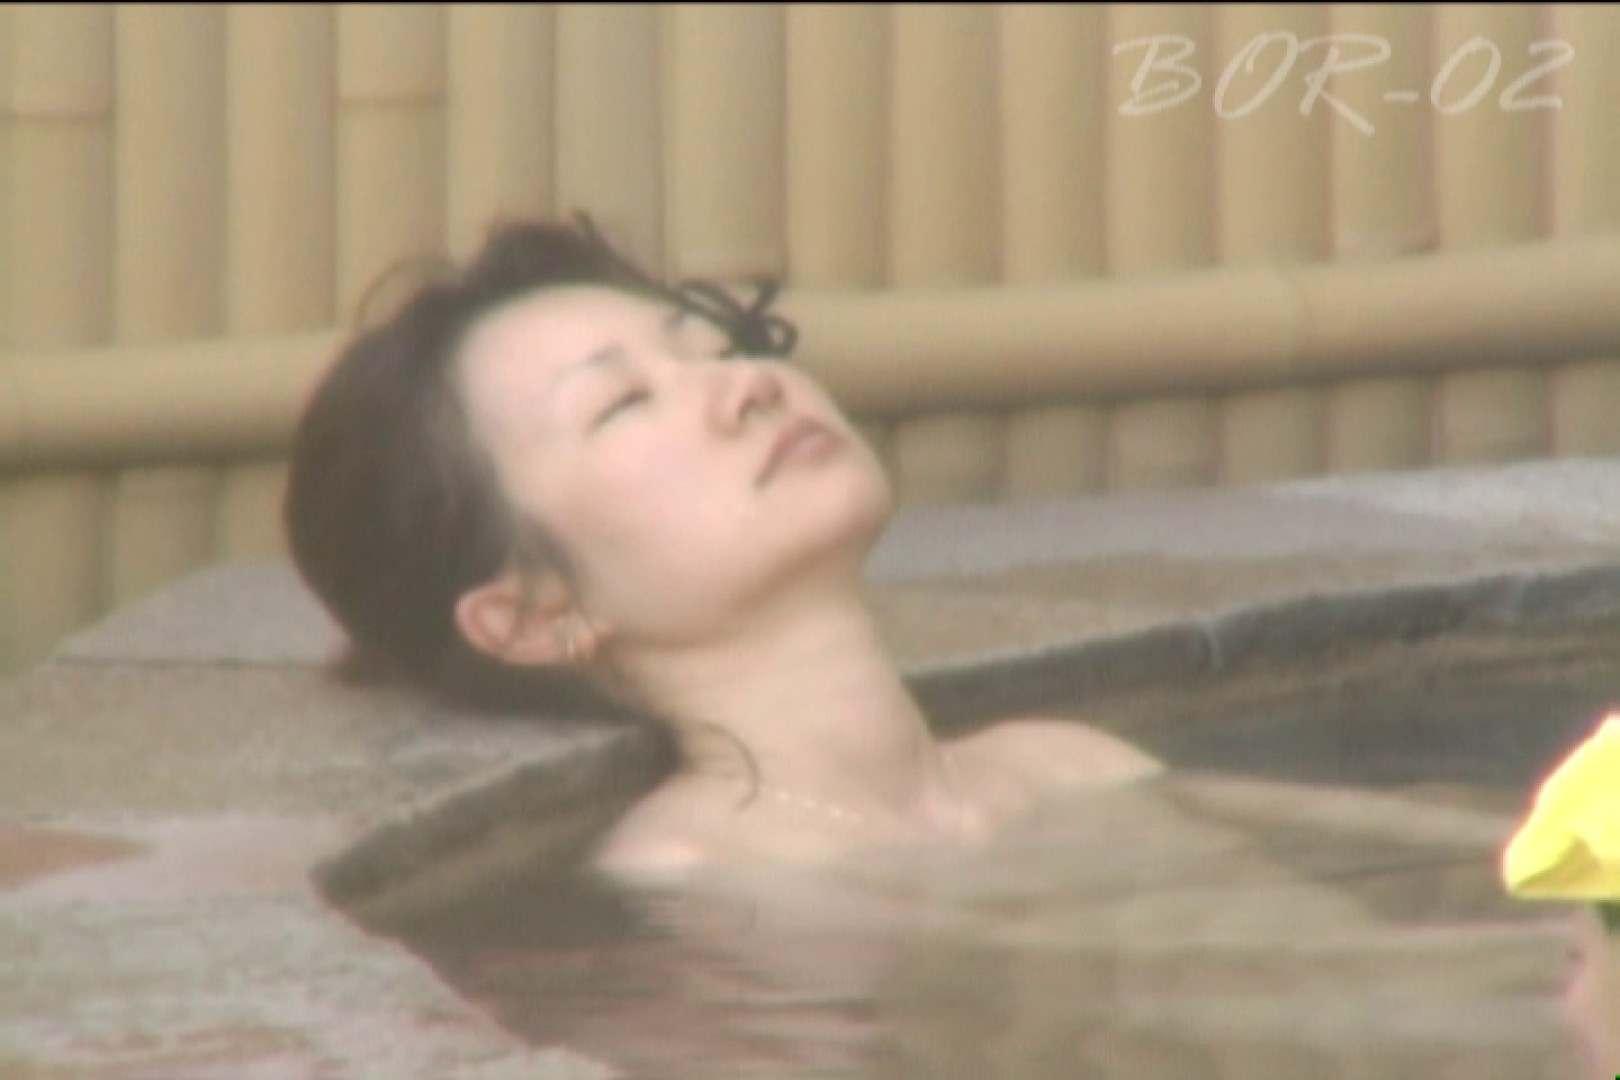 Aquaな露天風呂Vol.477 盗撮シリーズ | 露天風呂編  104PIX 41